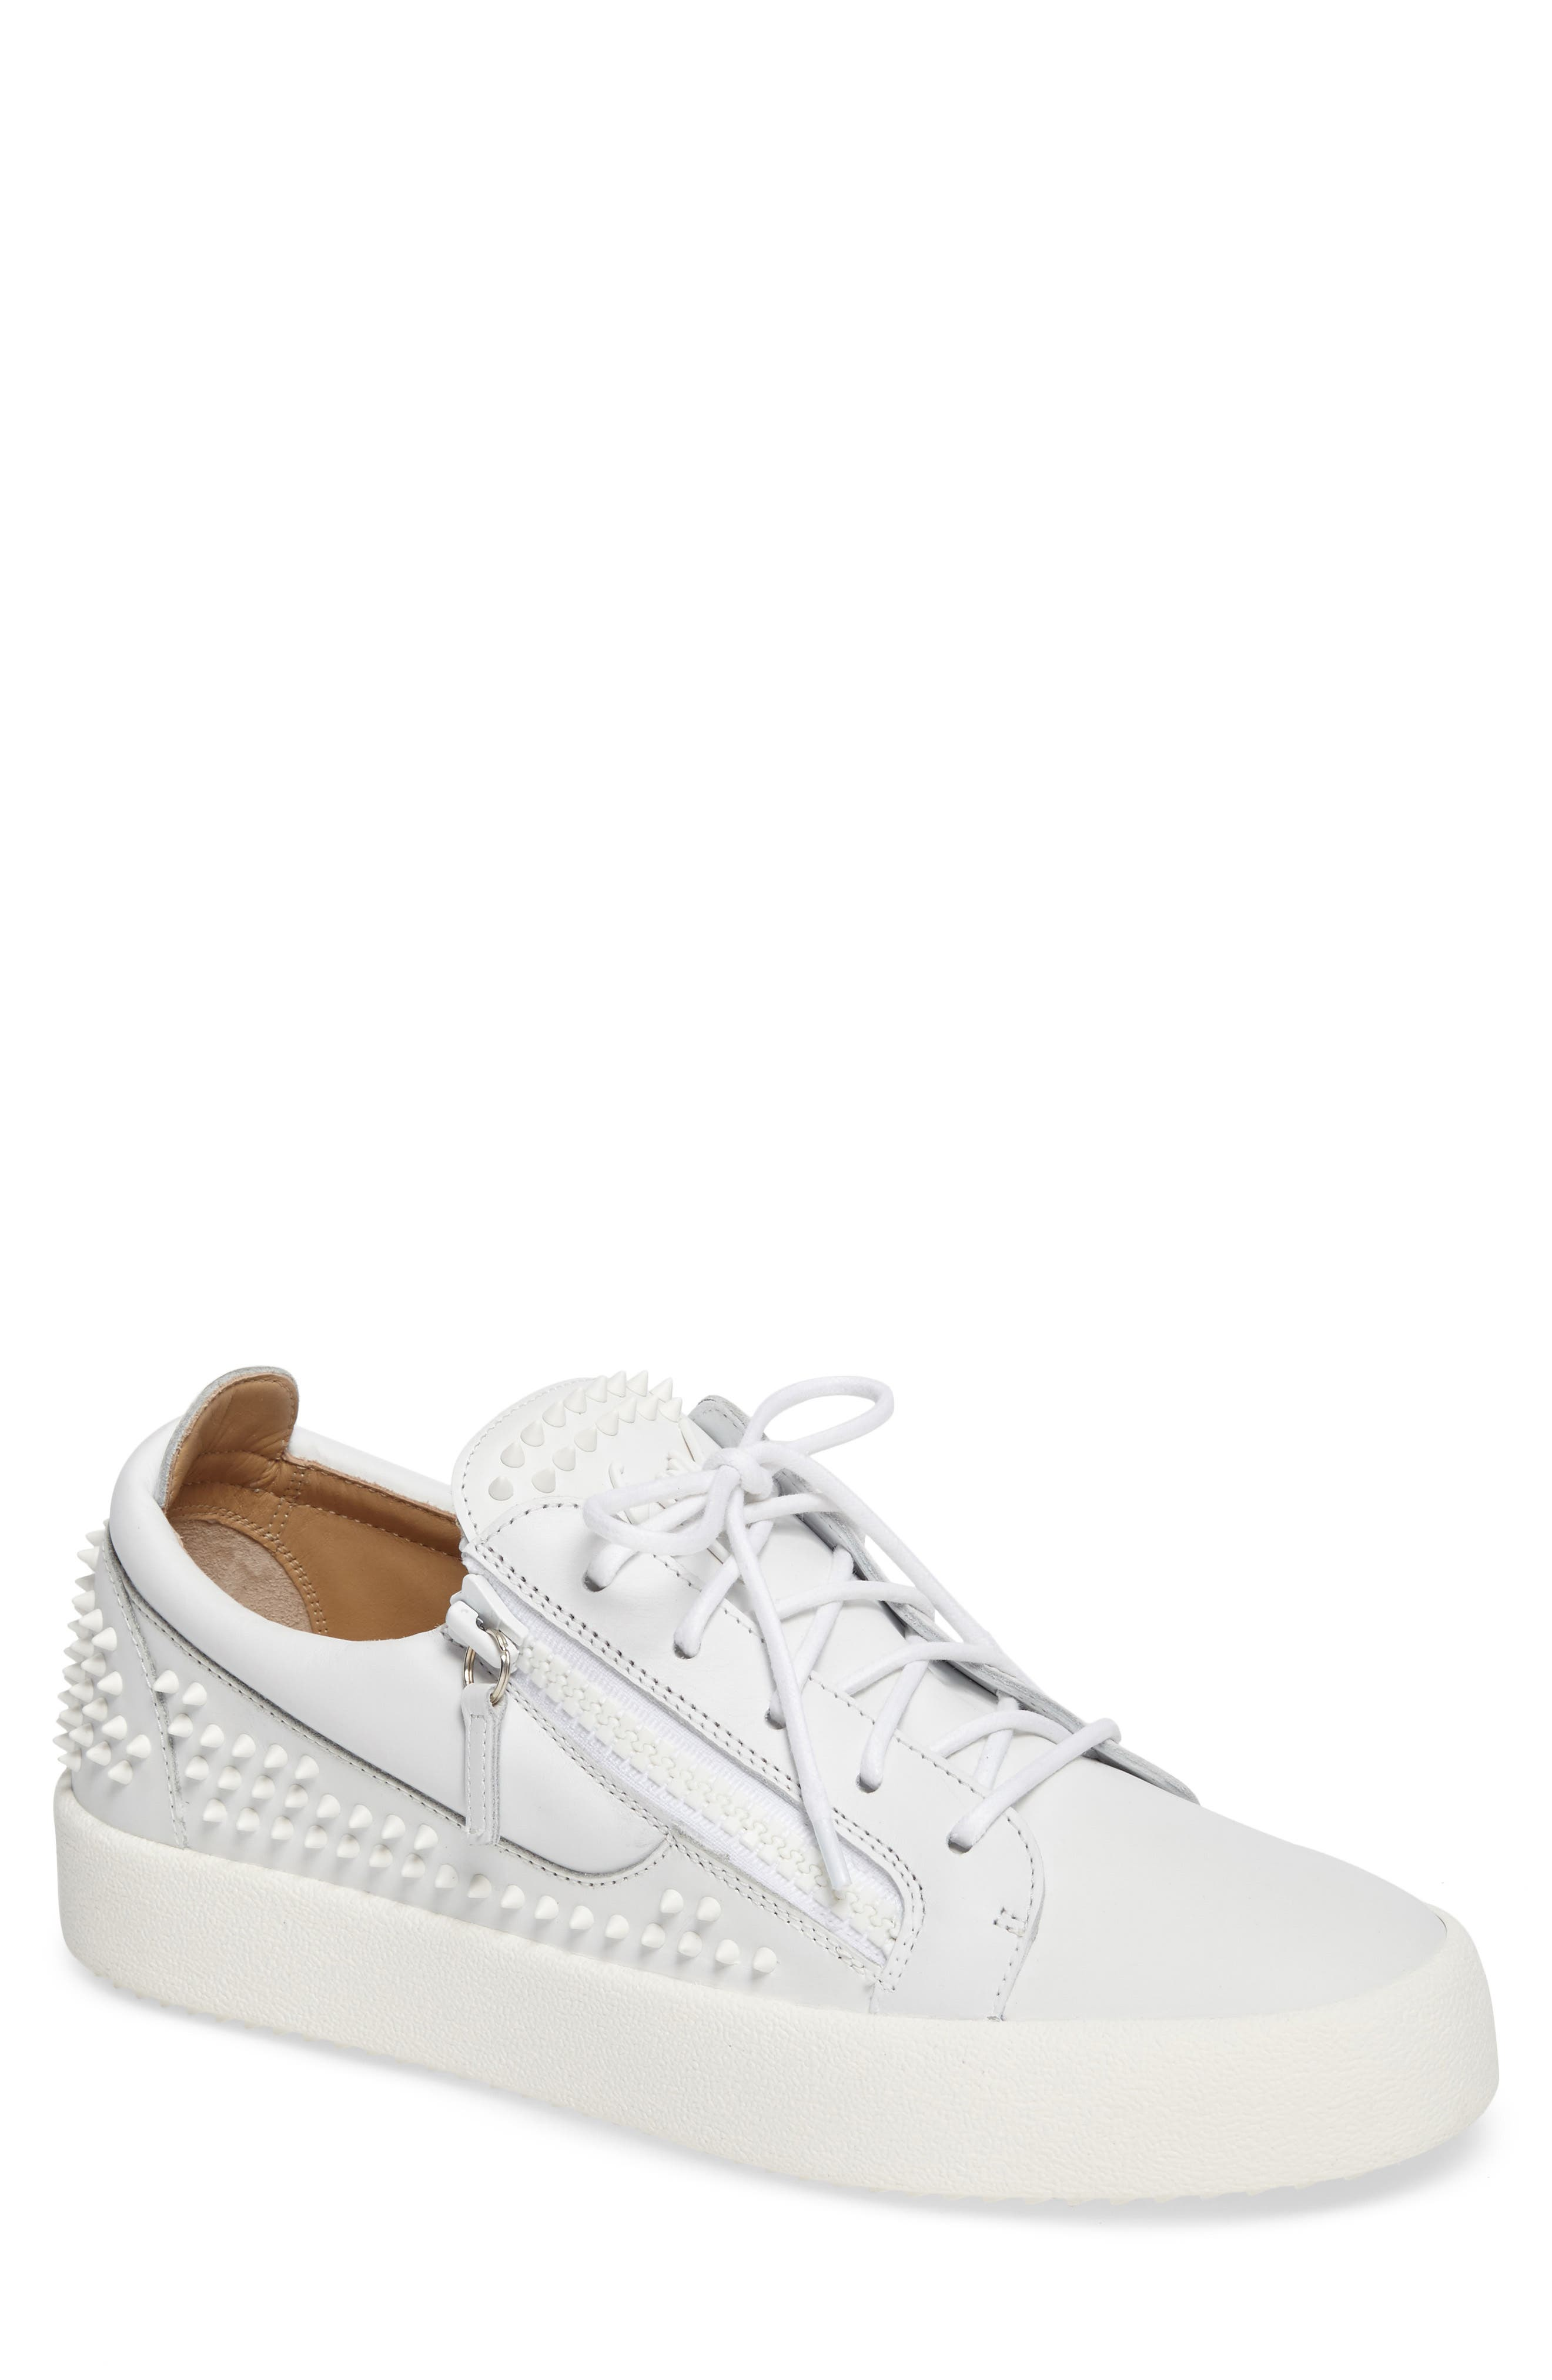 Alternate Image 1 Selected - Giuseppe Zanotti Low-Top Sneaker (Men)